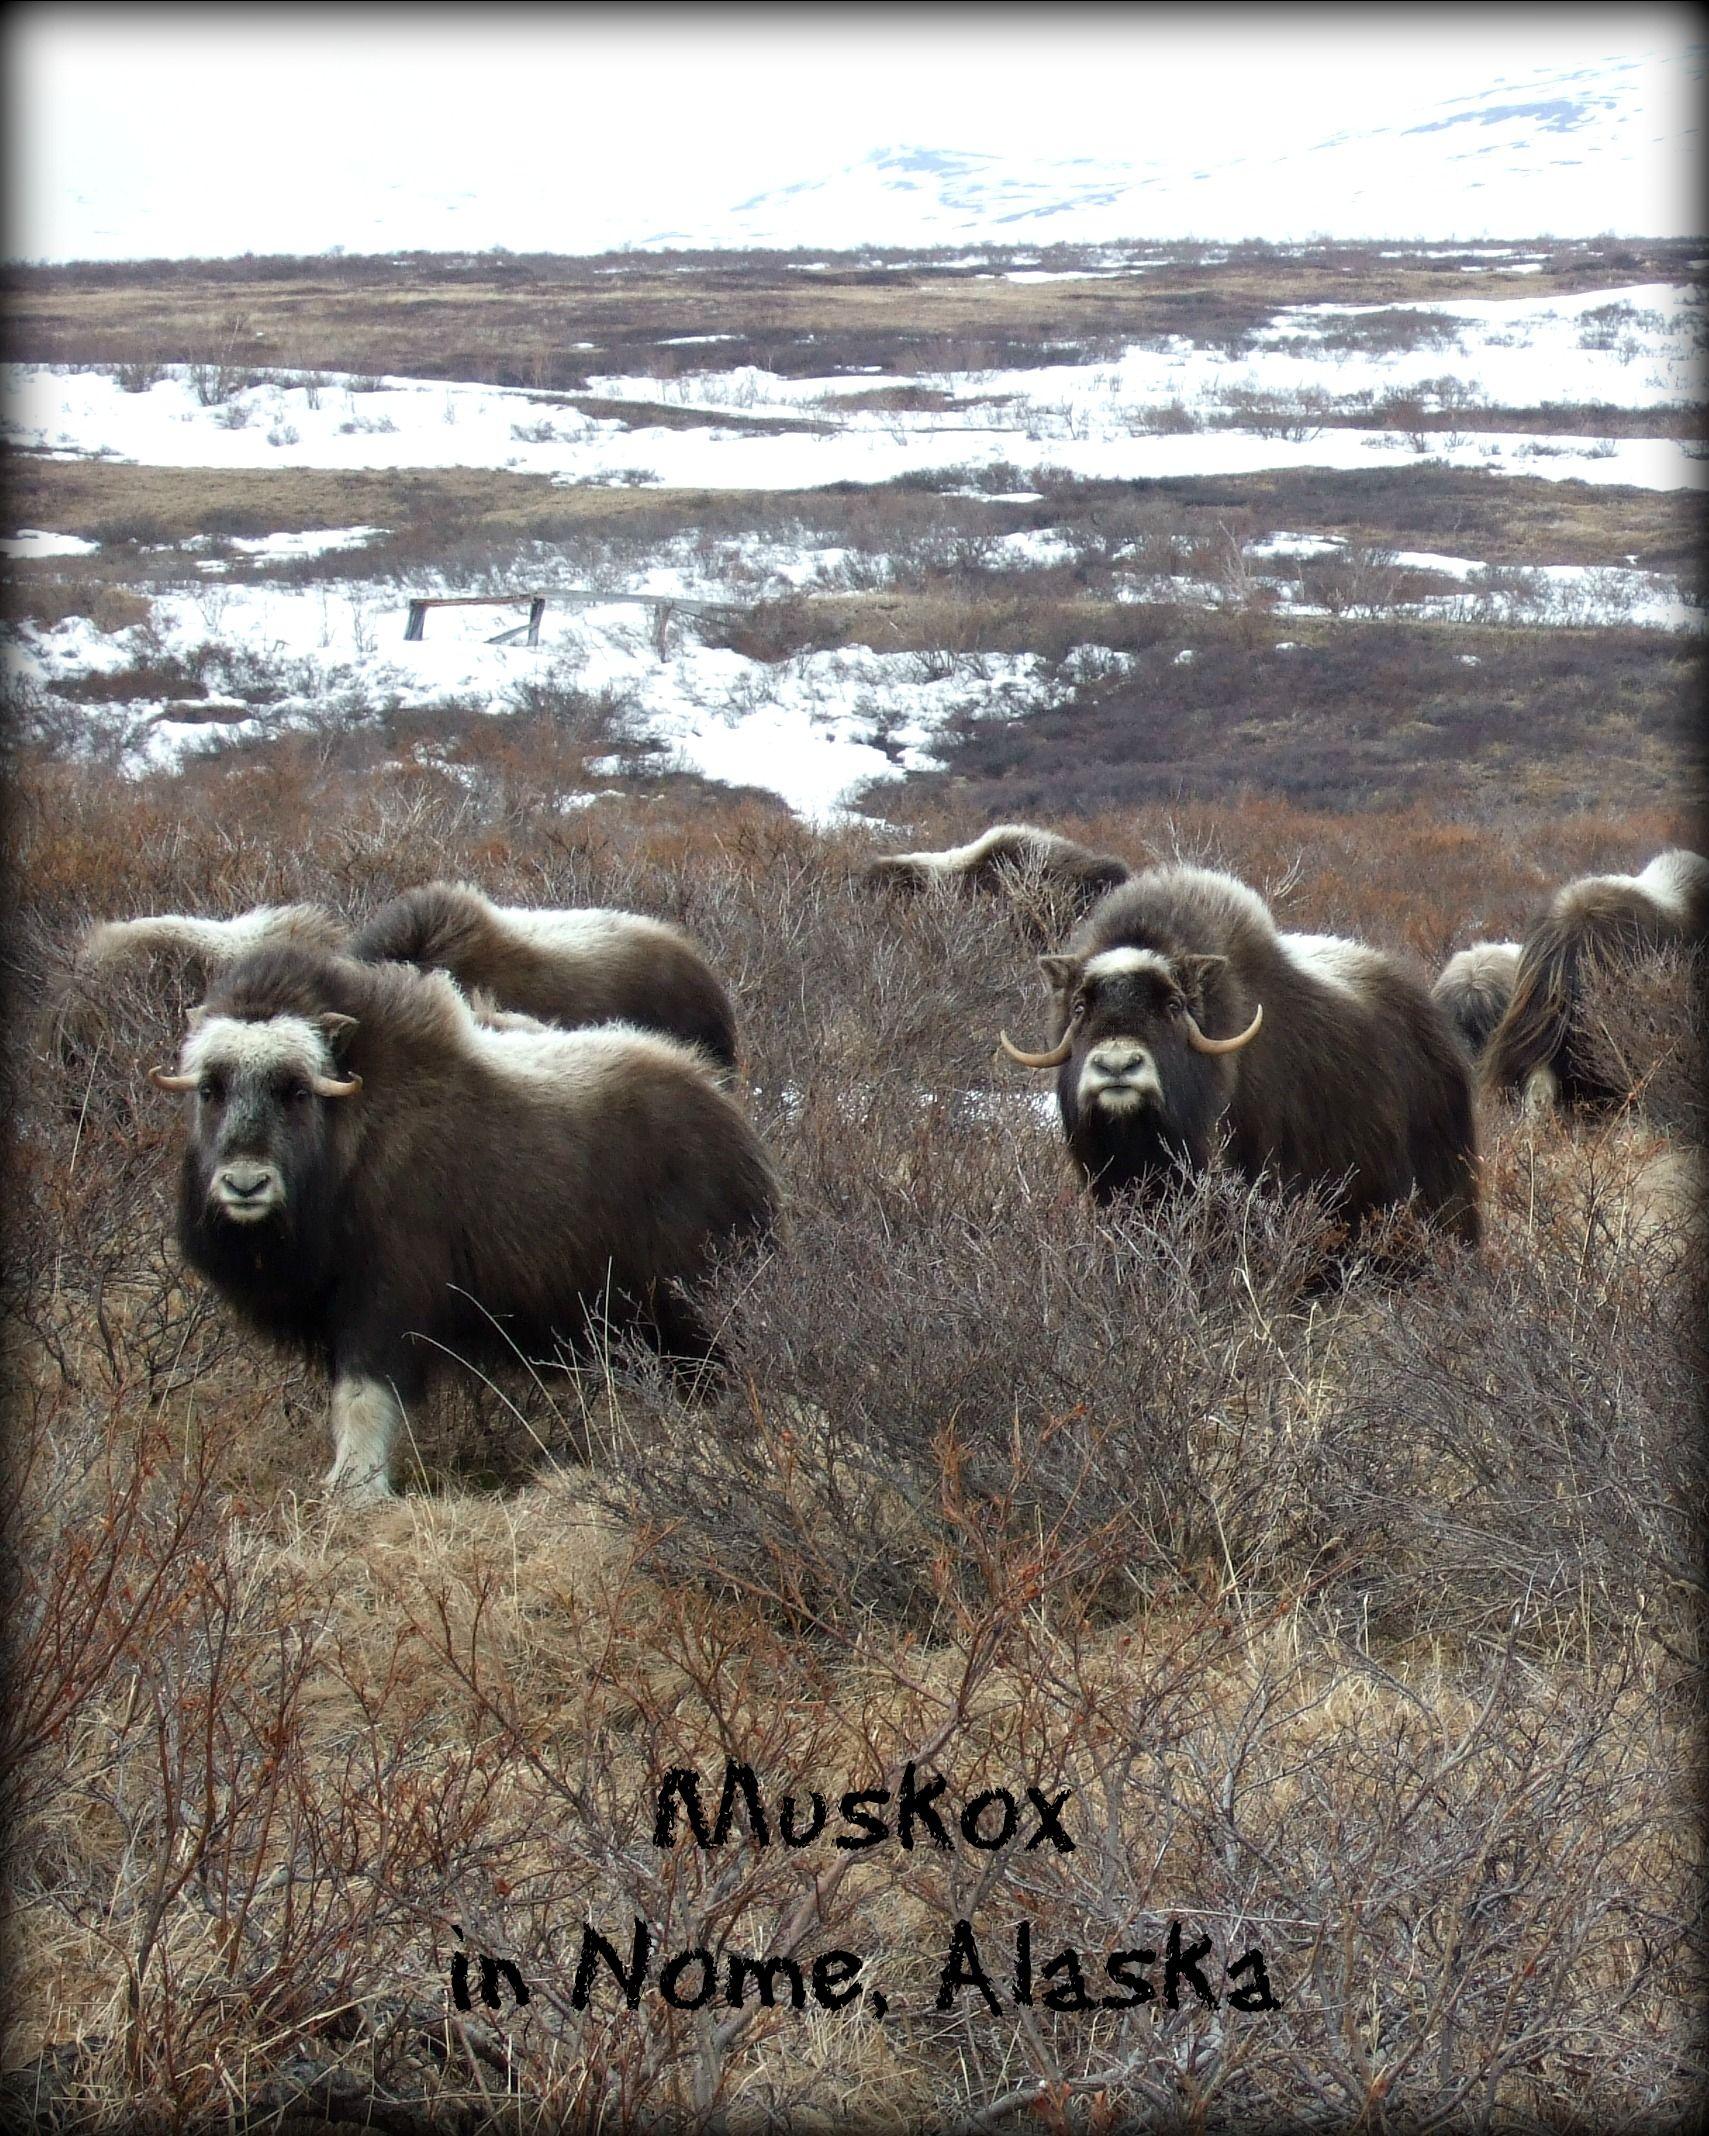 Muskox - Nome, Alaska